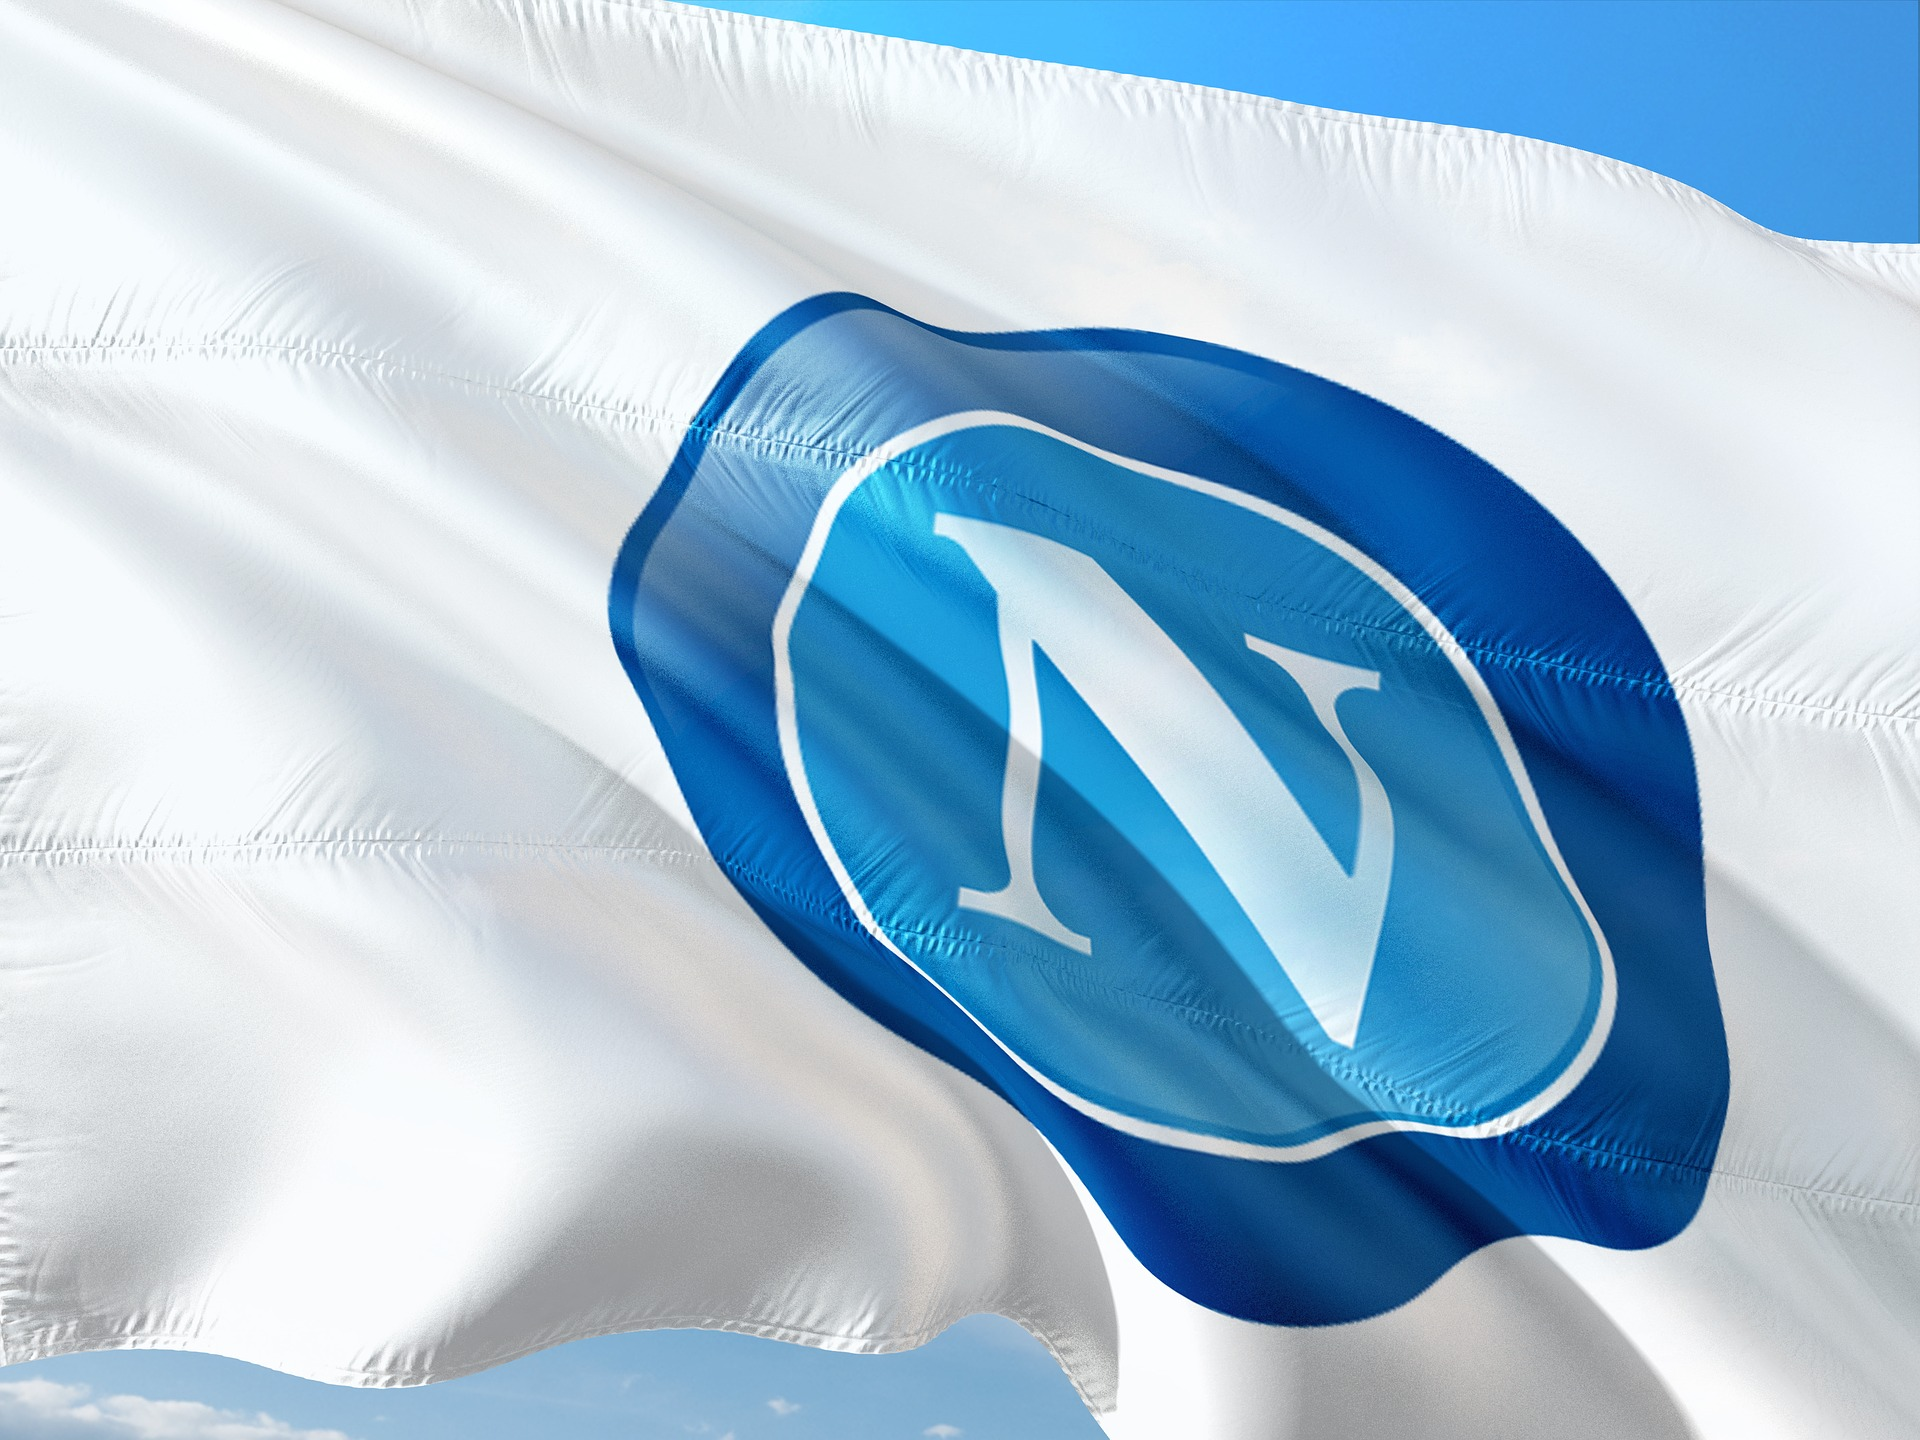 Napoli Spiel Heute